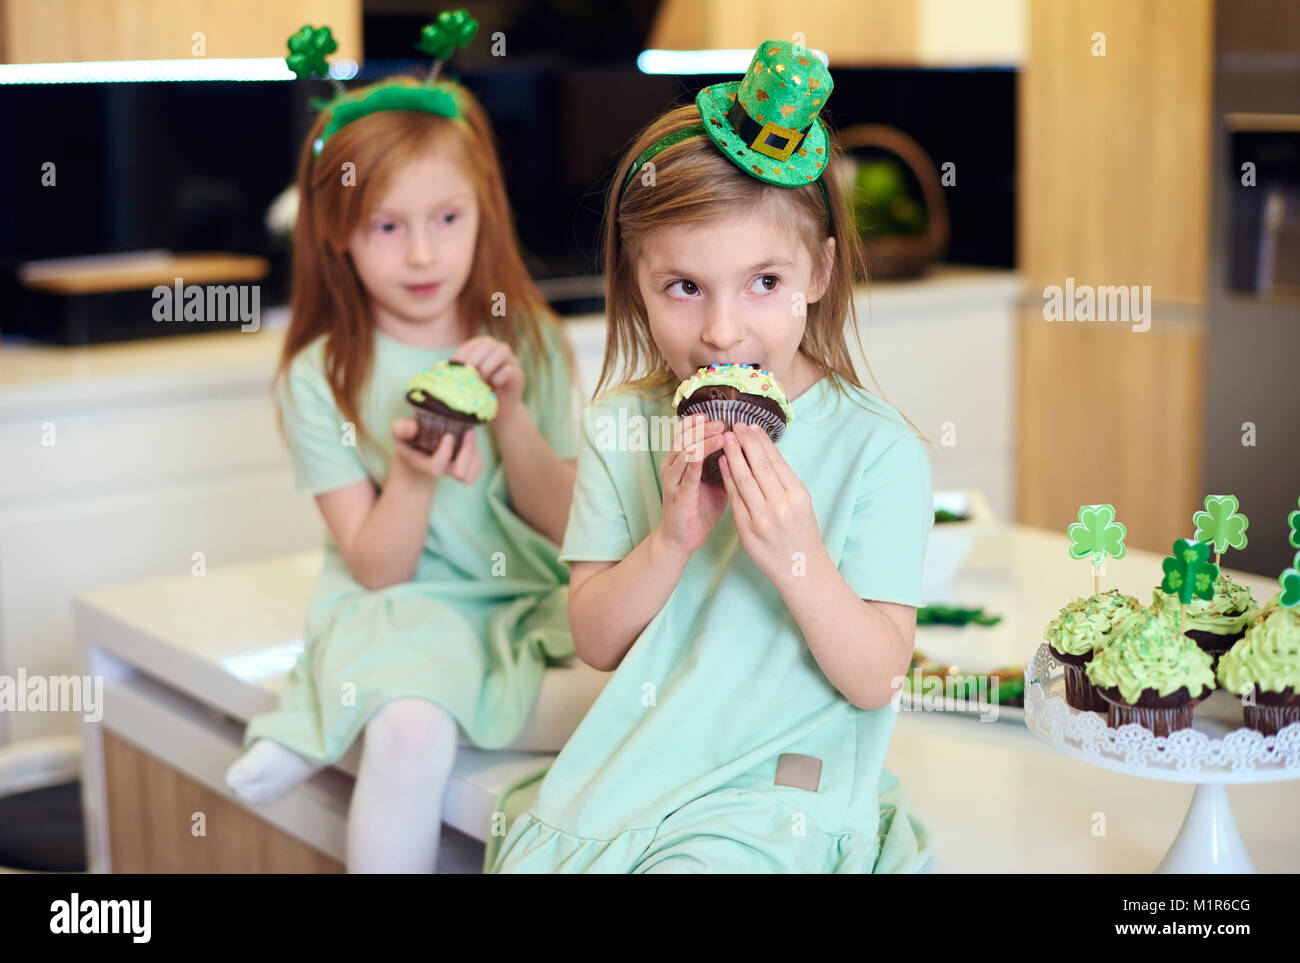 Portrait of children eating cupcake - Stock Image